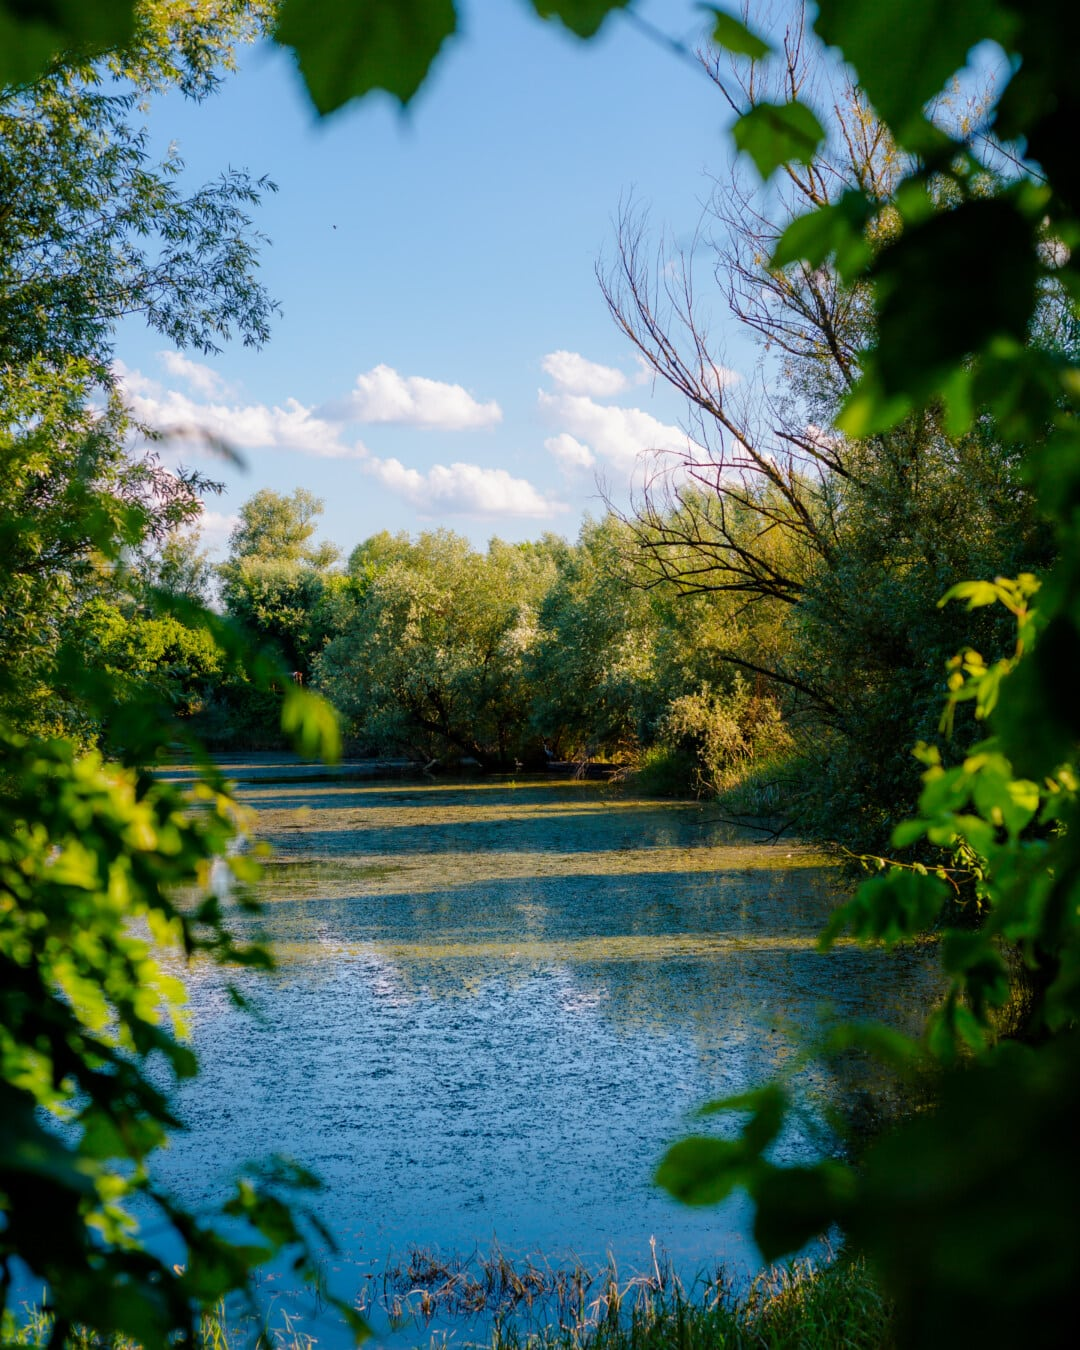 swamp, channels, marshland, ecosystem, aquatic plant, water, park, tree, plant, leaf